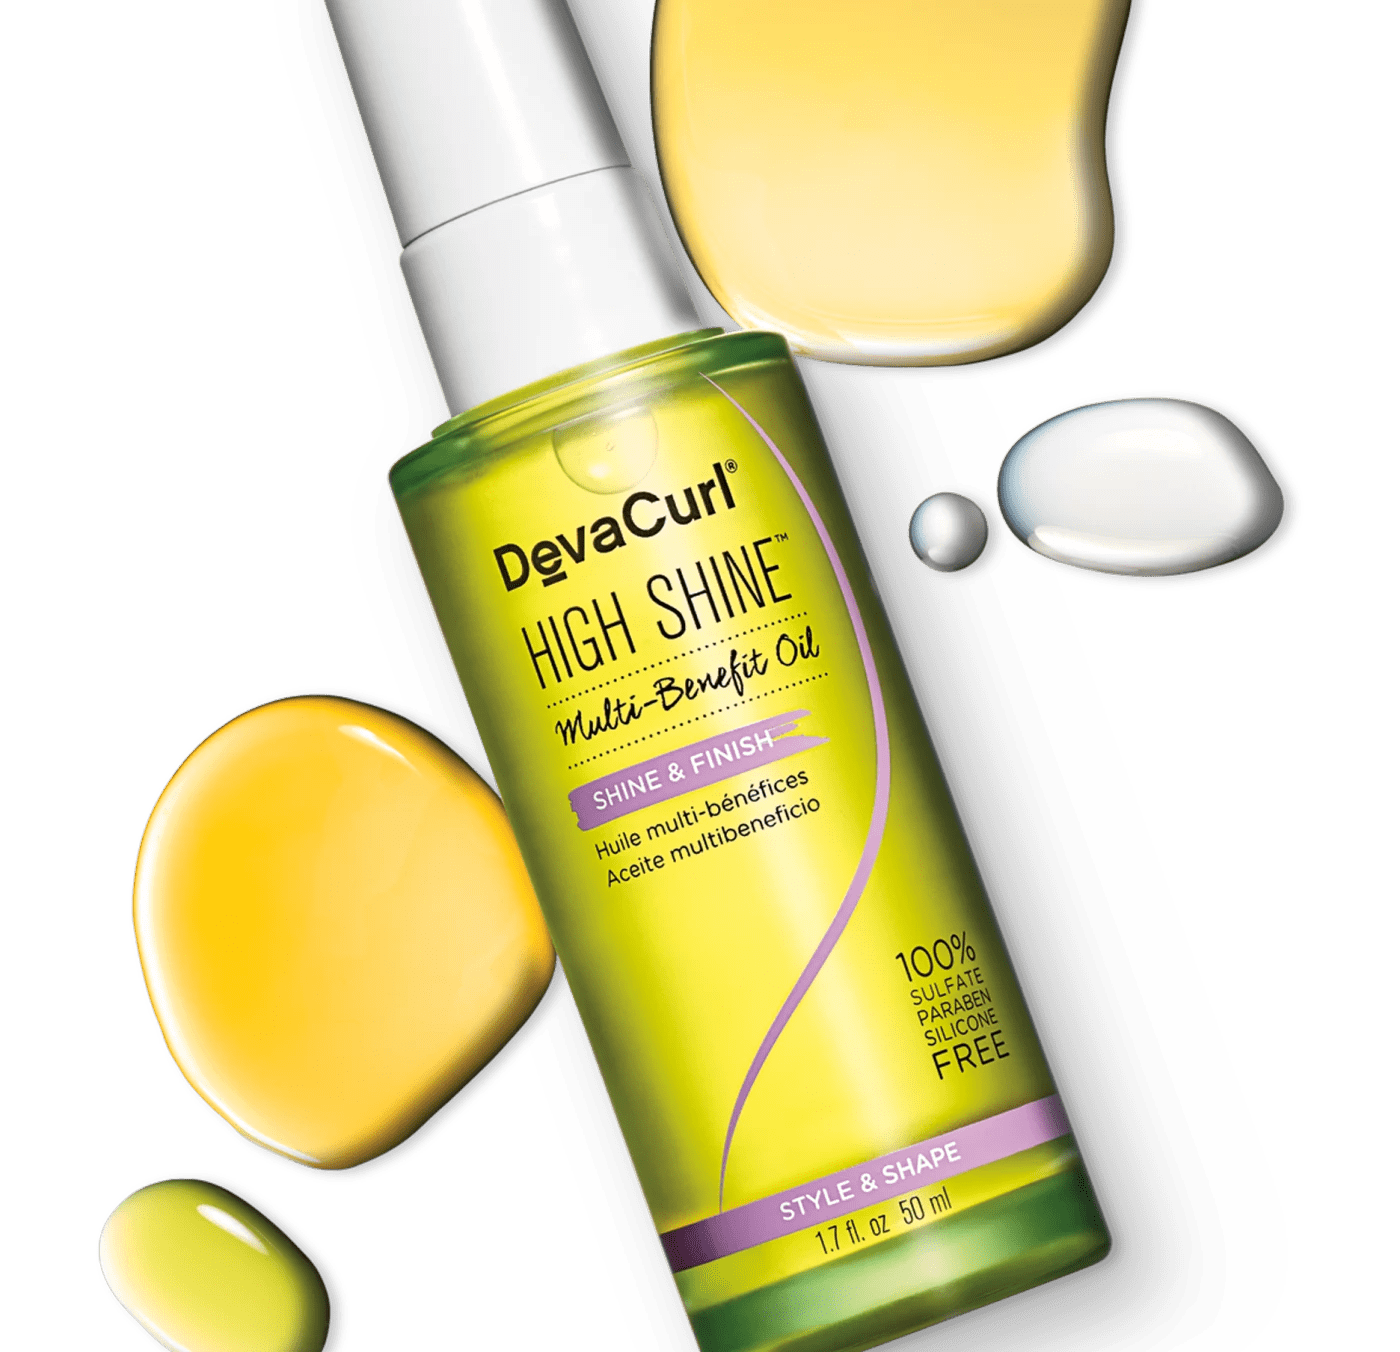 bottle of DevaCurl high shine with oil splash